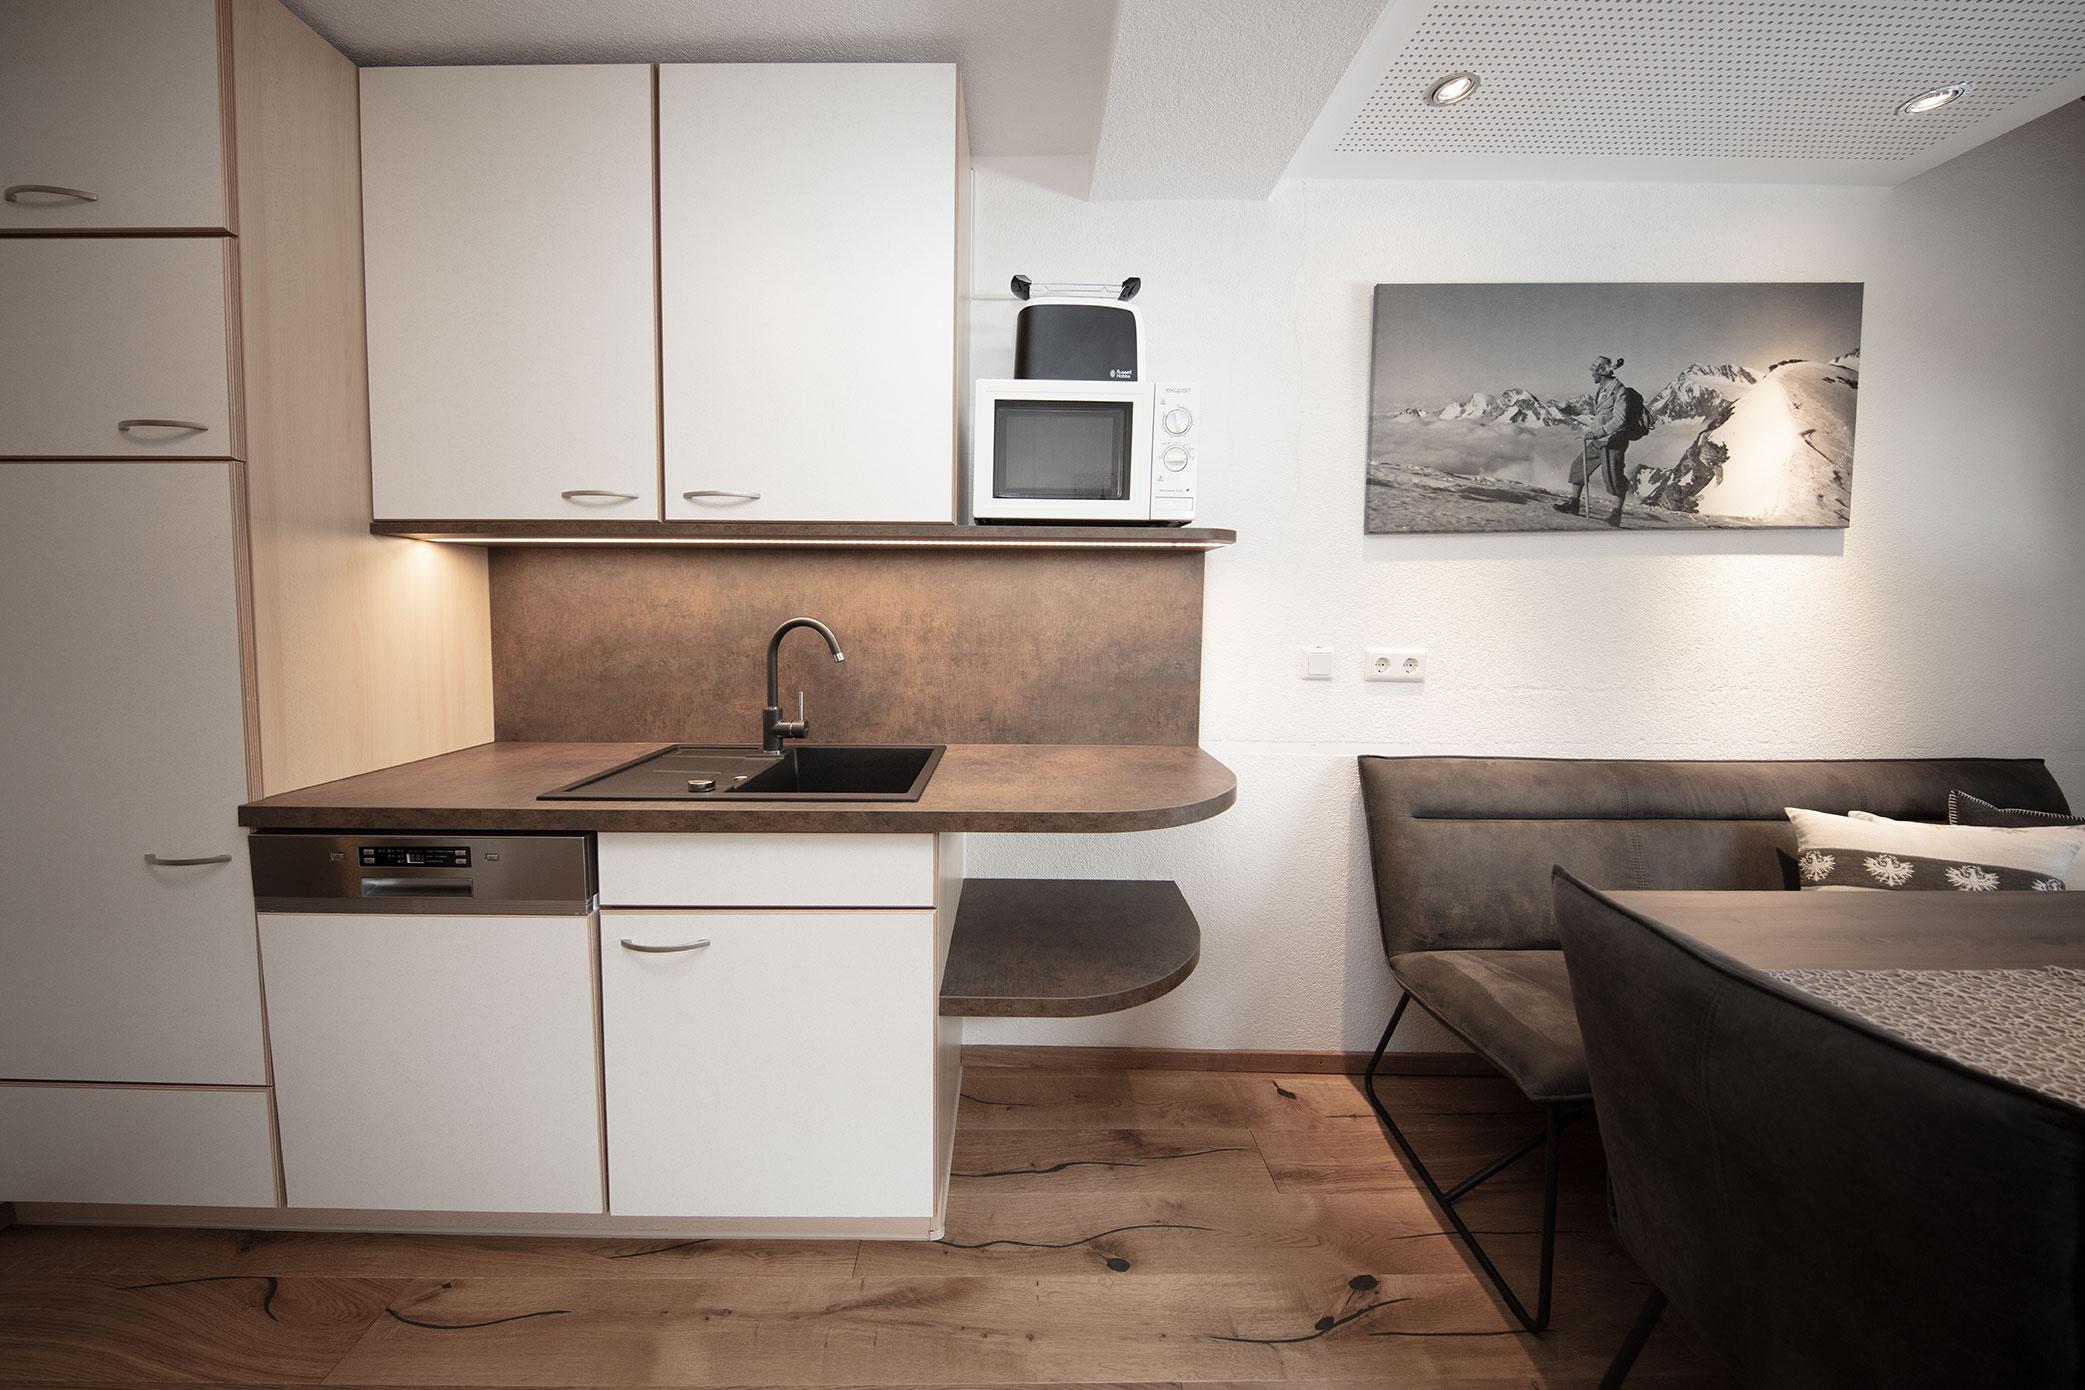 Kueche Appartement 1